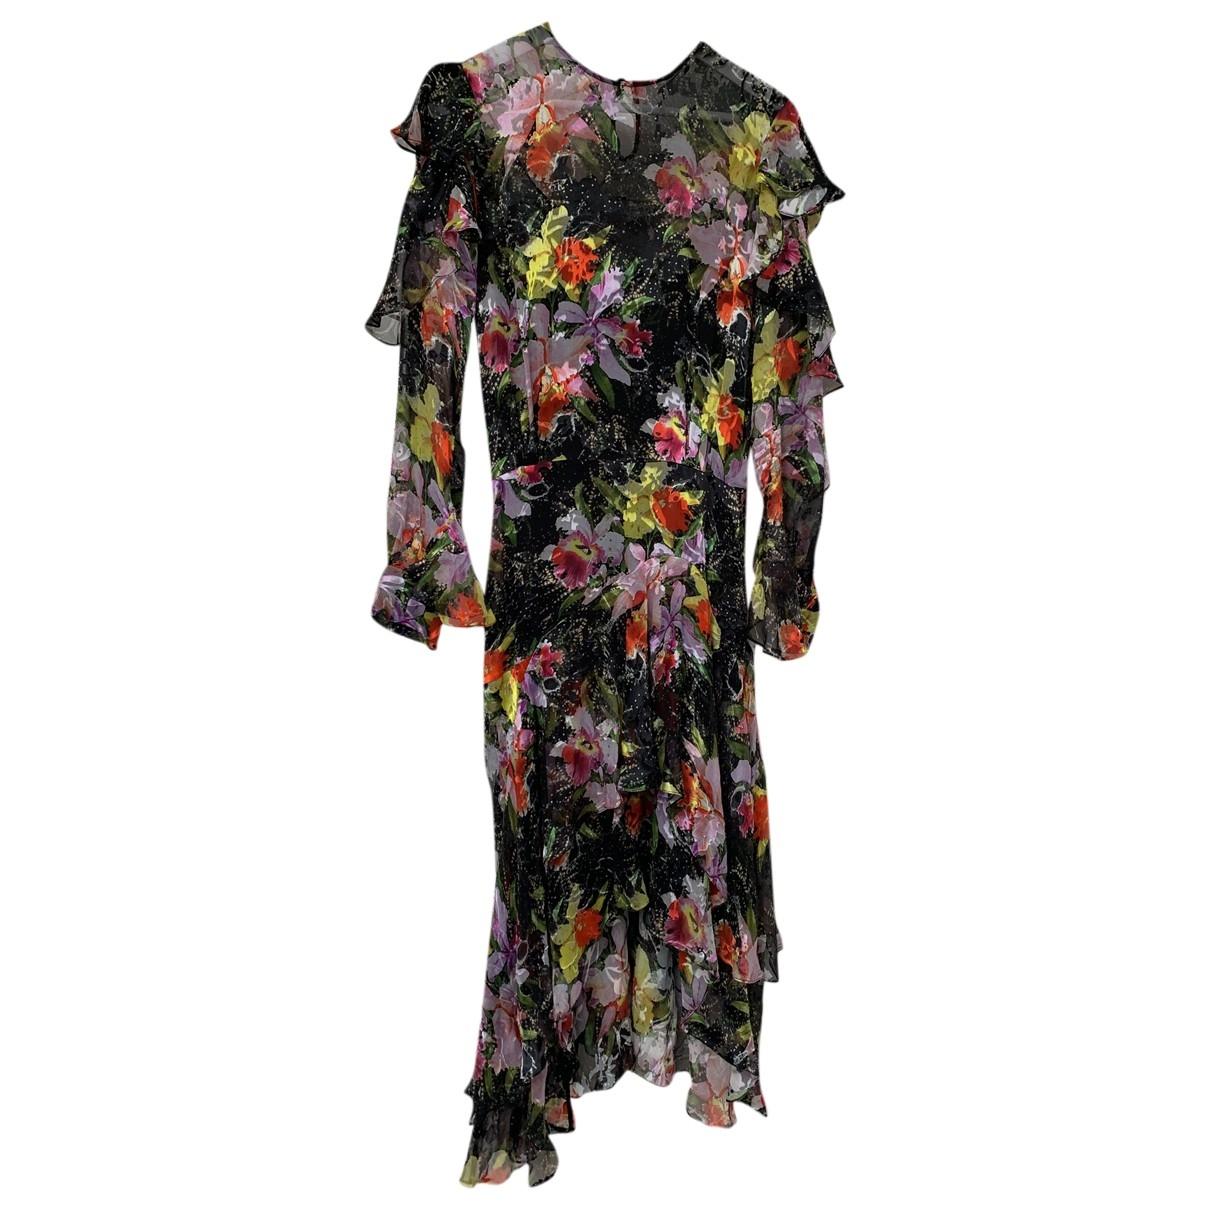 Preen By Thornton Bregazzi - Robe   pour femme en soie - multicolore